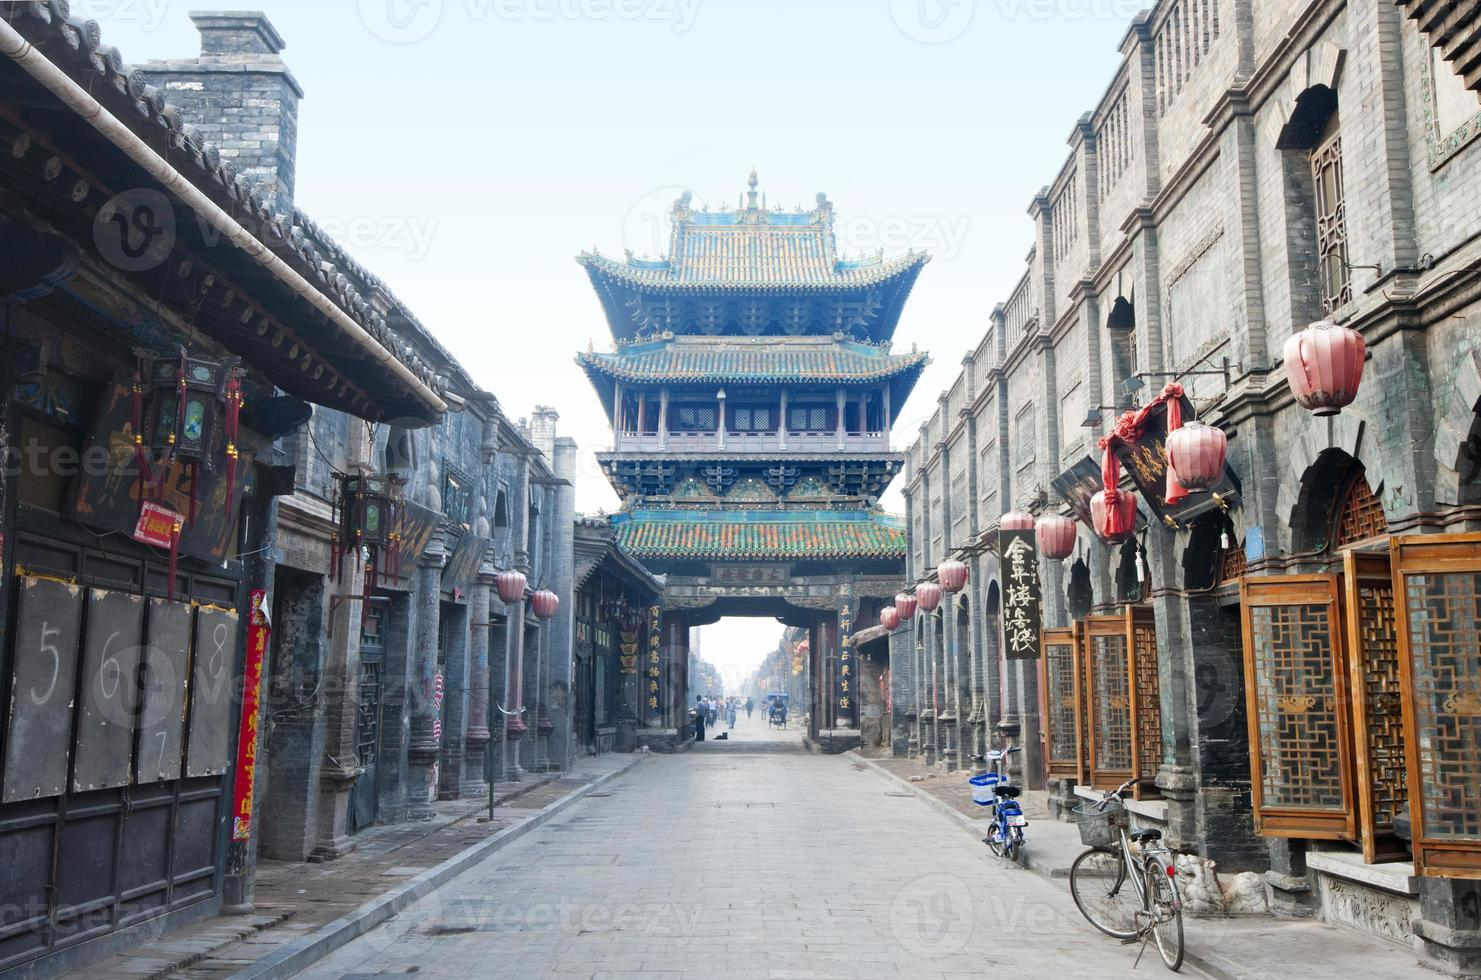 historisk kinesisk stad (gamla stan i Pingyao, Kina) foto